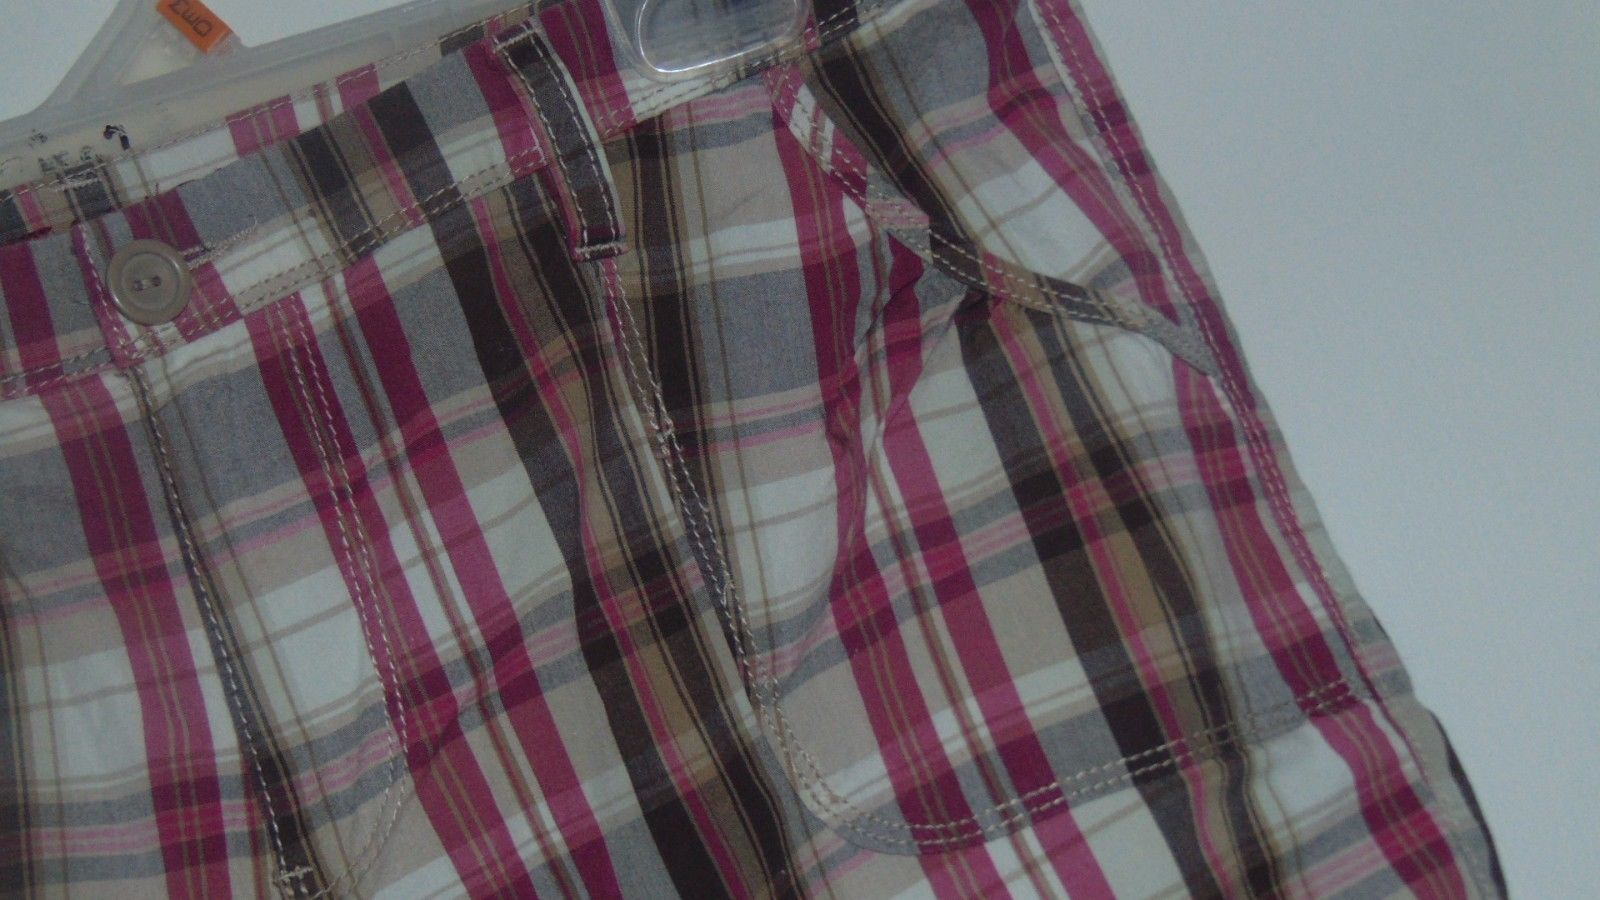 Ladies S 12 Gitano Stretch Walking Bermuda Shorts Plaid Gray-Brown-Gray 4 Pocket